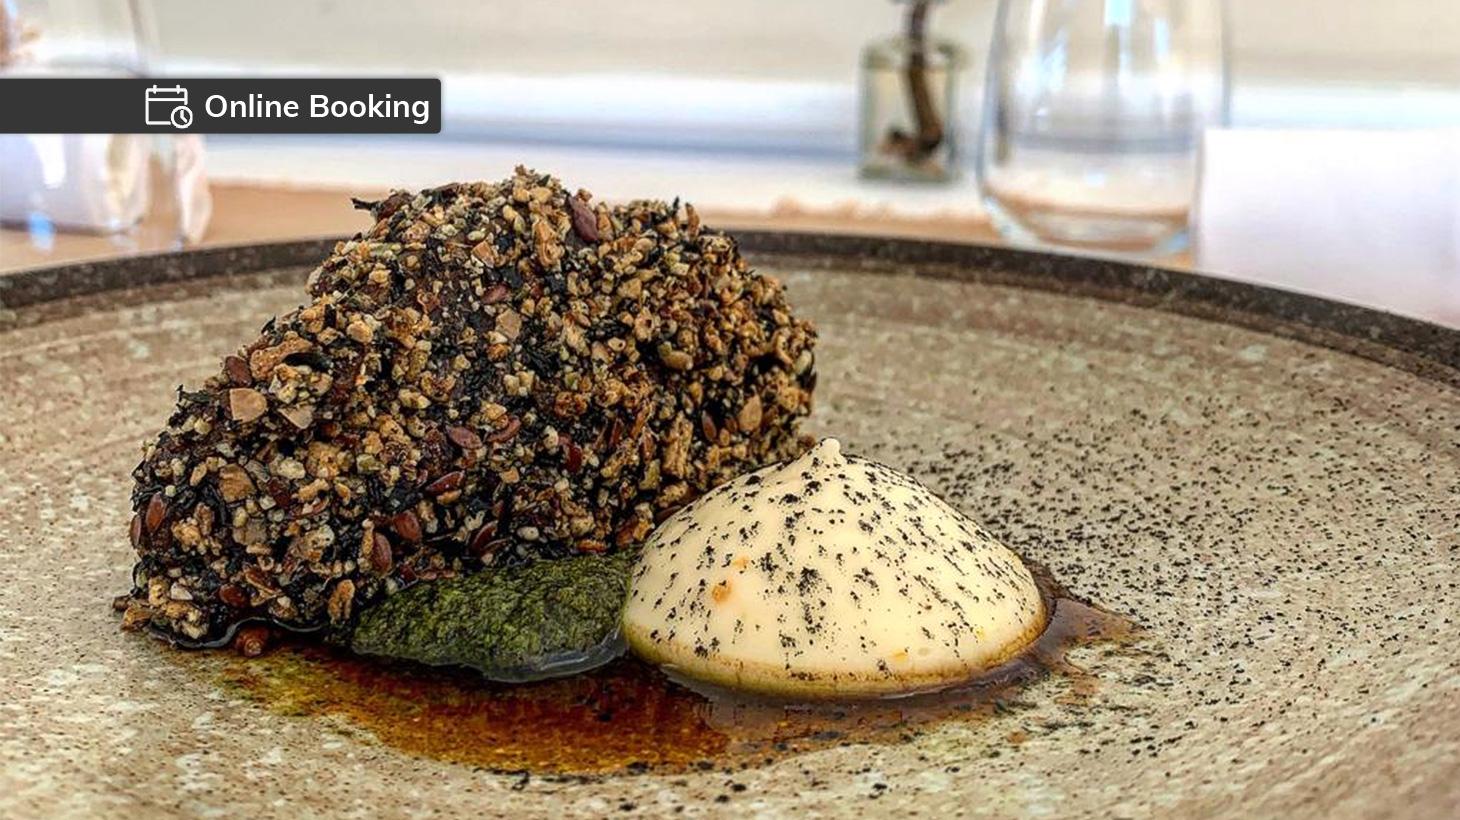 Tajima Wagyu beef cheek served at Cottage Point Inn